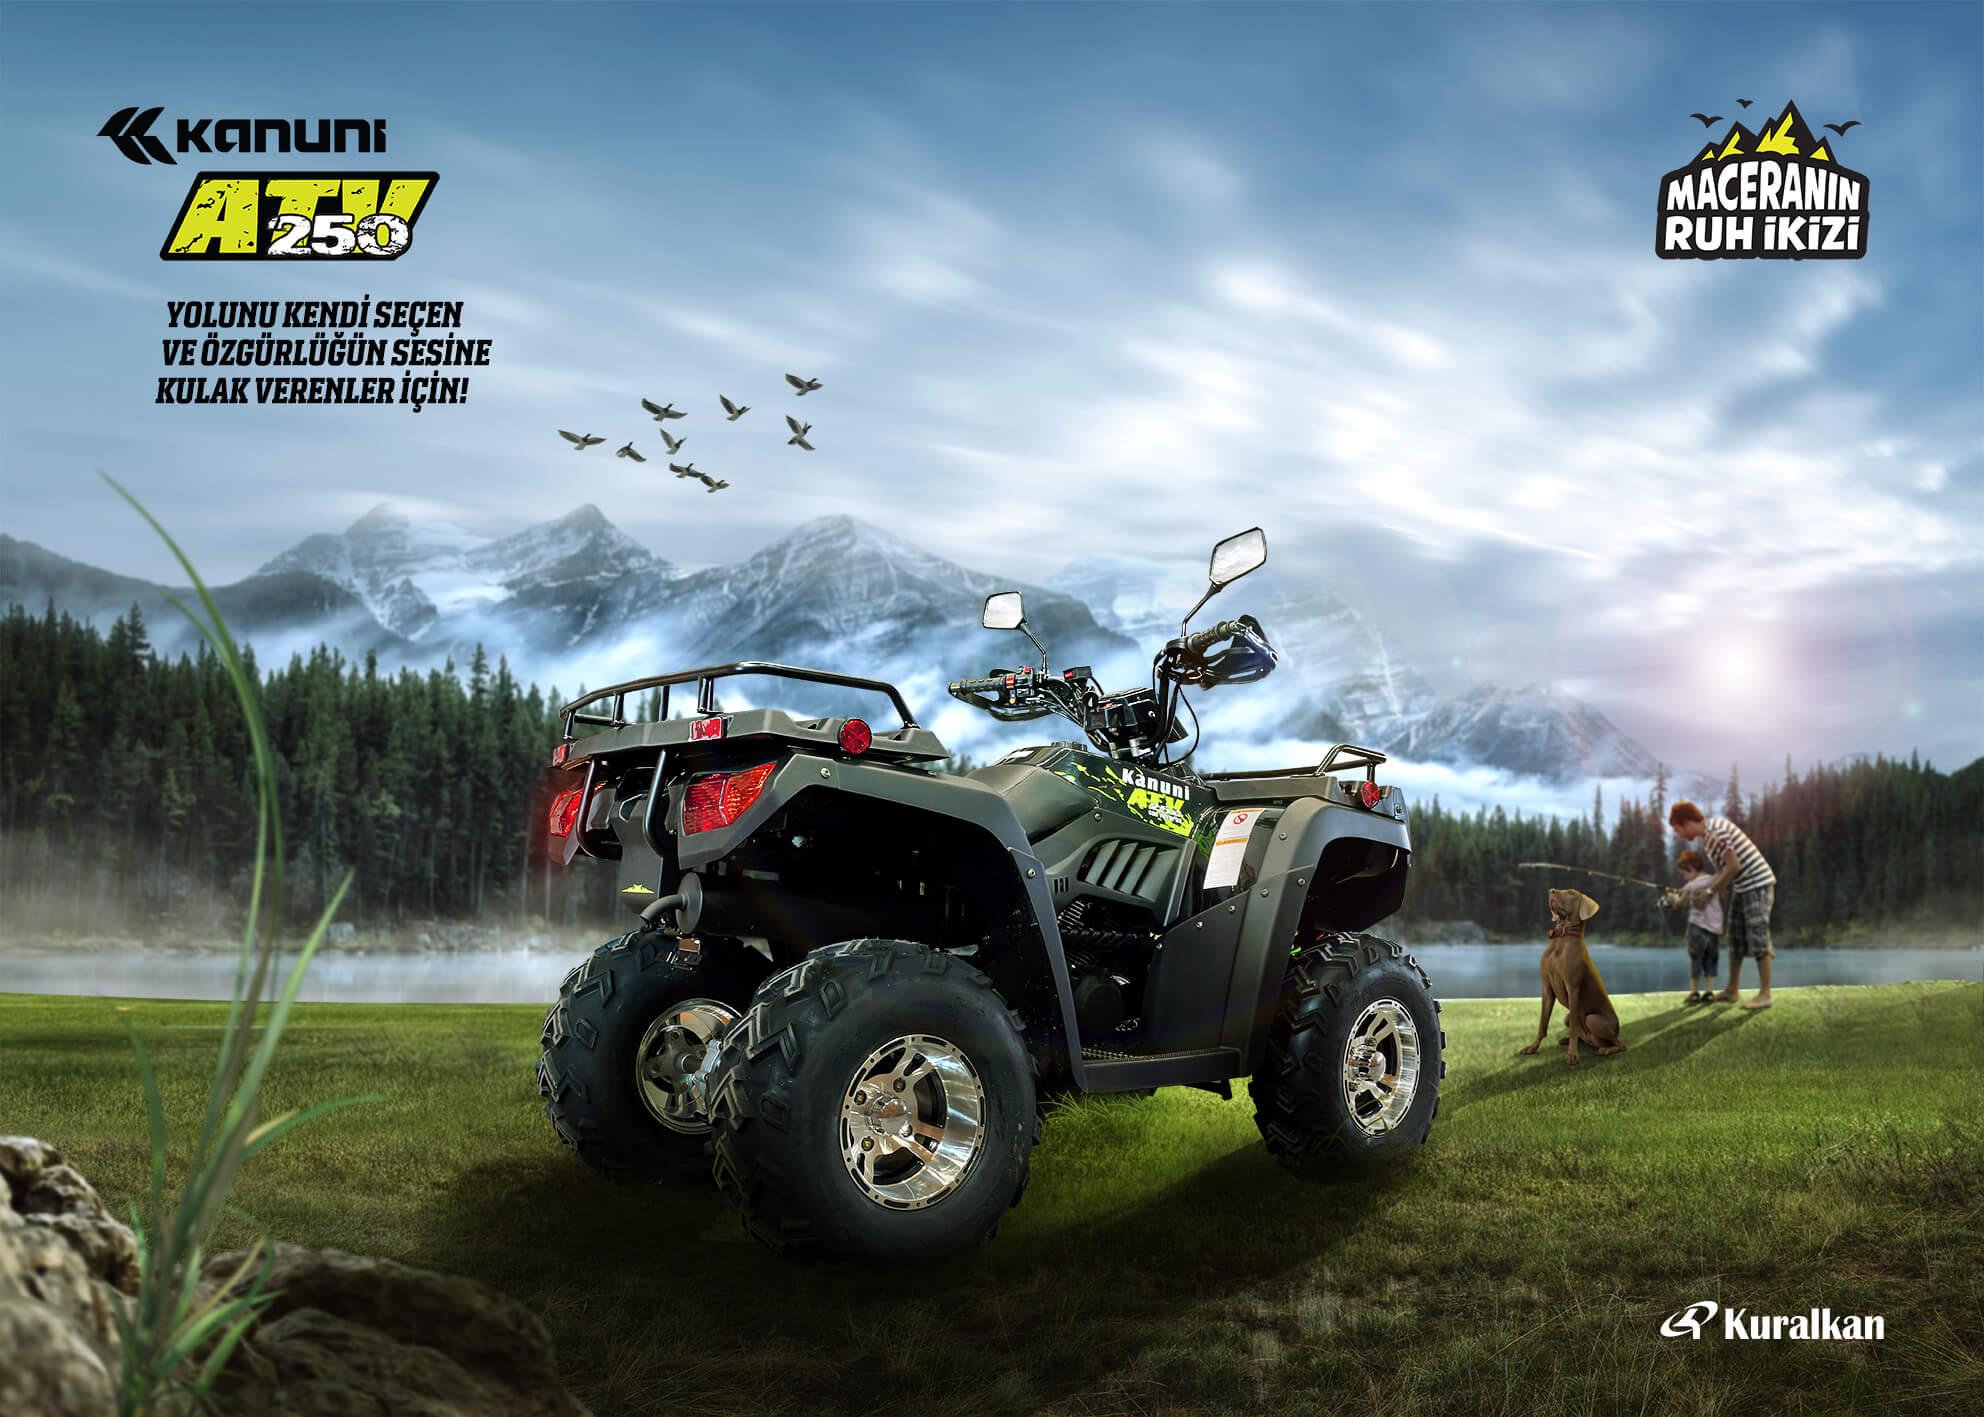 Kanuni ATV 250 KeyVisual 2021